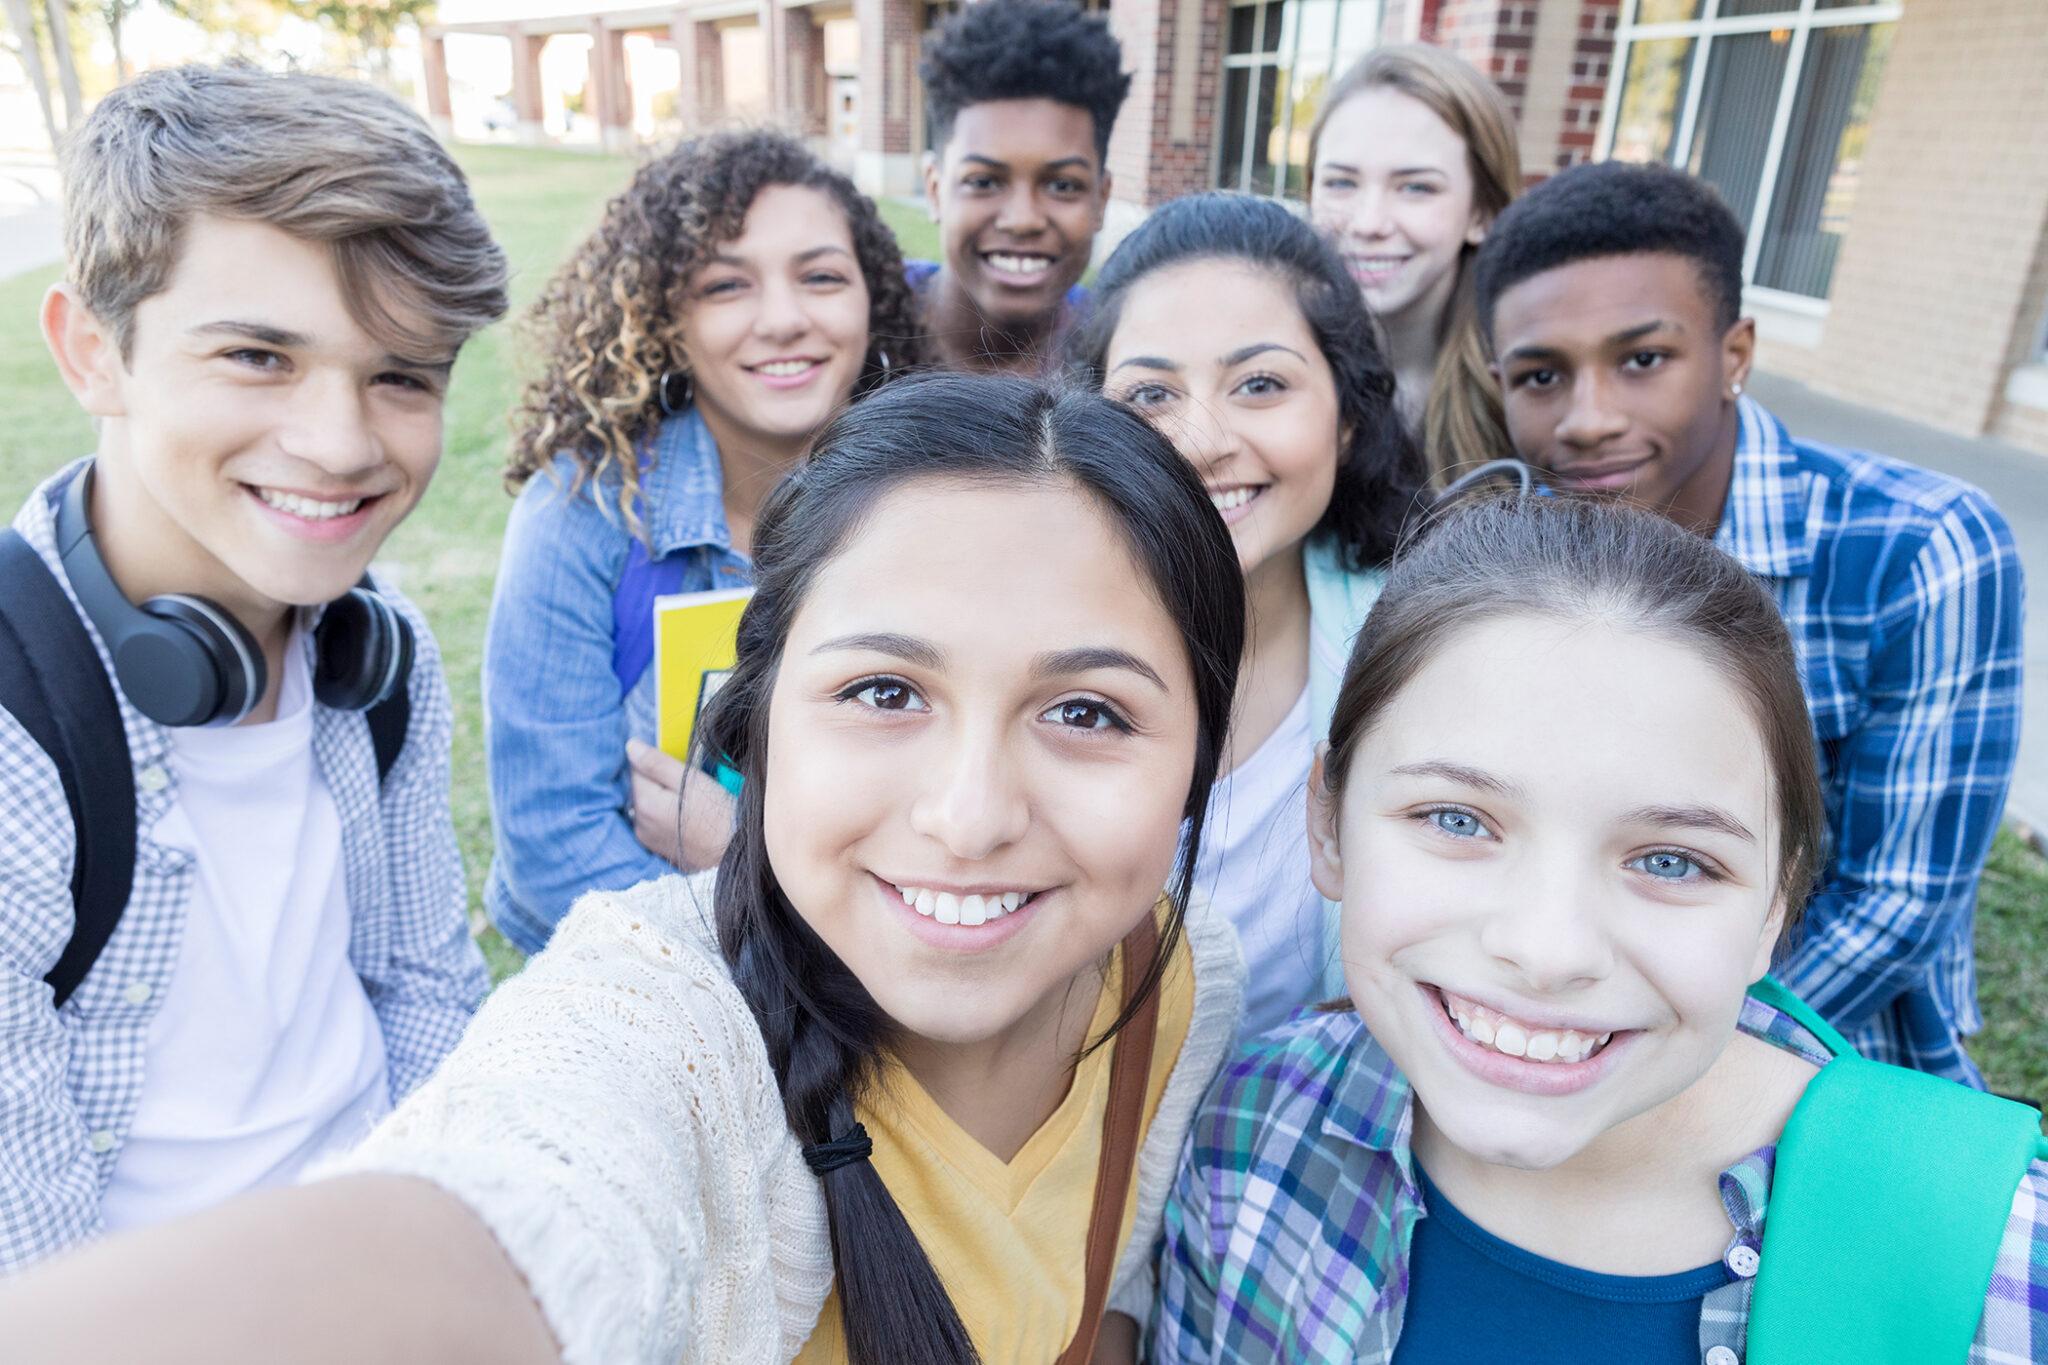 israeli teens summer experience